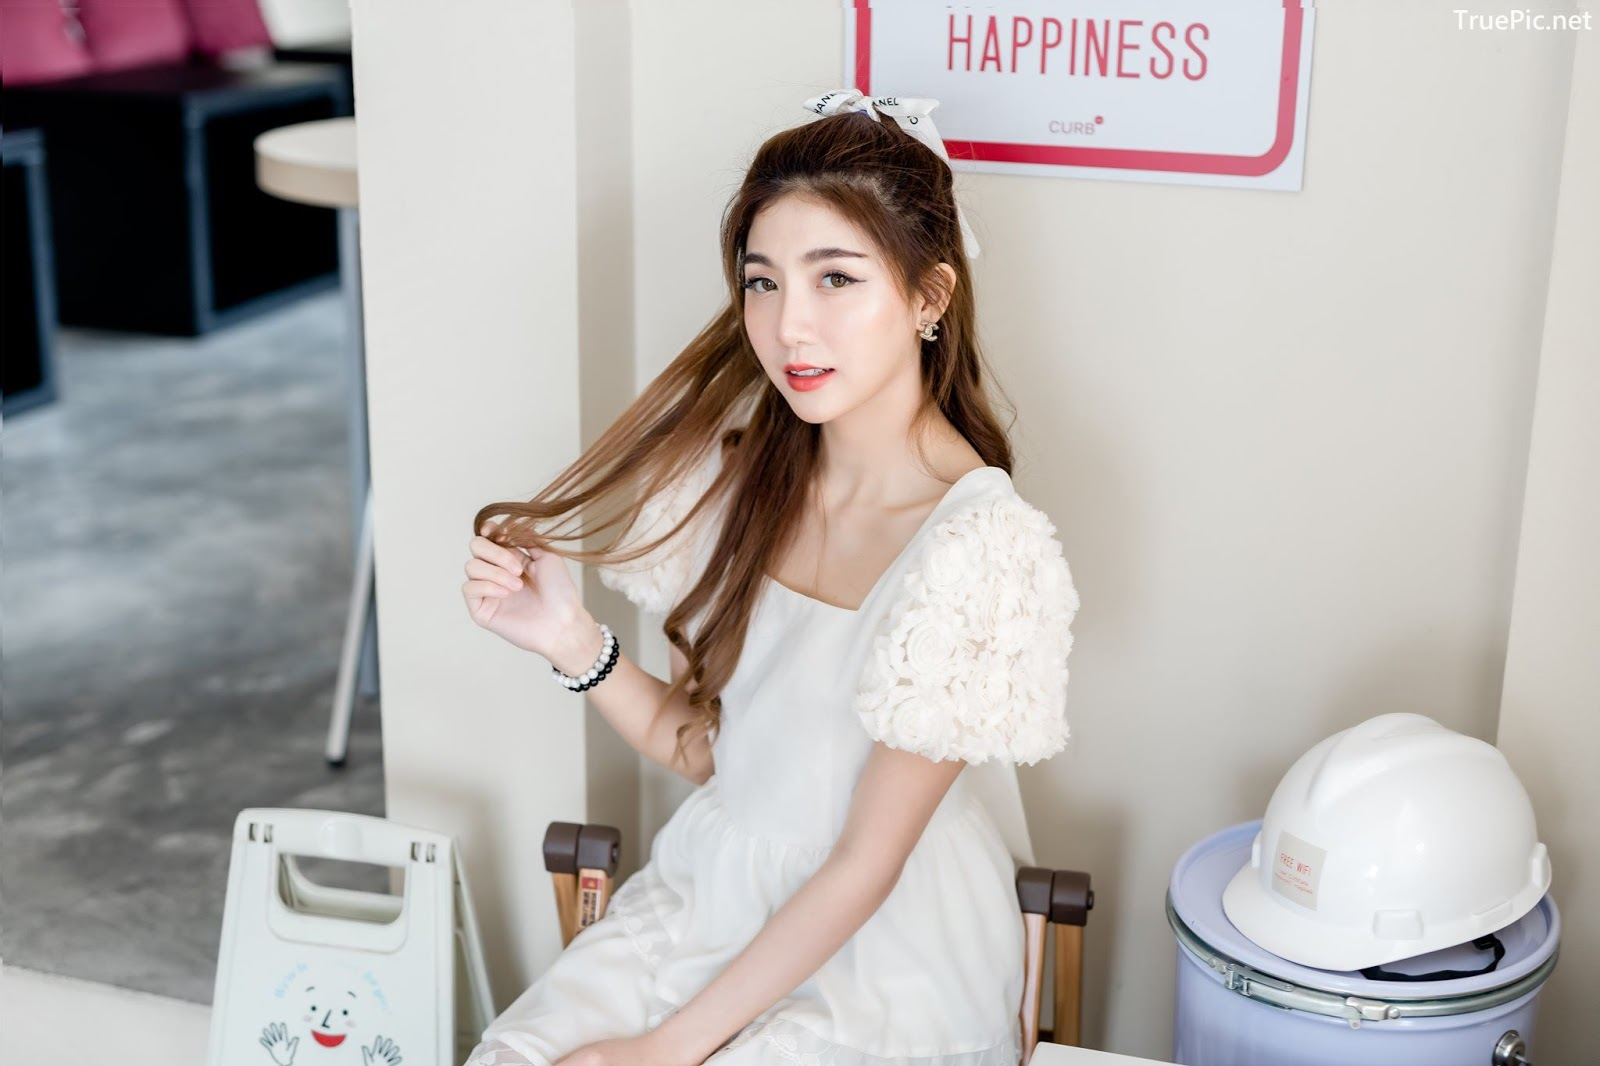 Image Thailand Model - Sasi Ngiunwan - Barbie Doll Smile - TruePic.net - Picture-6